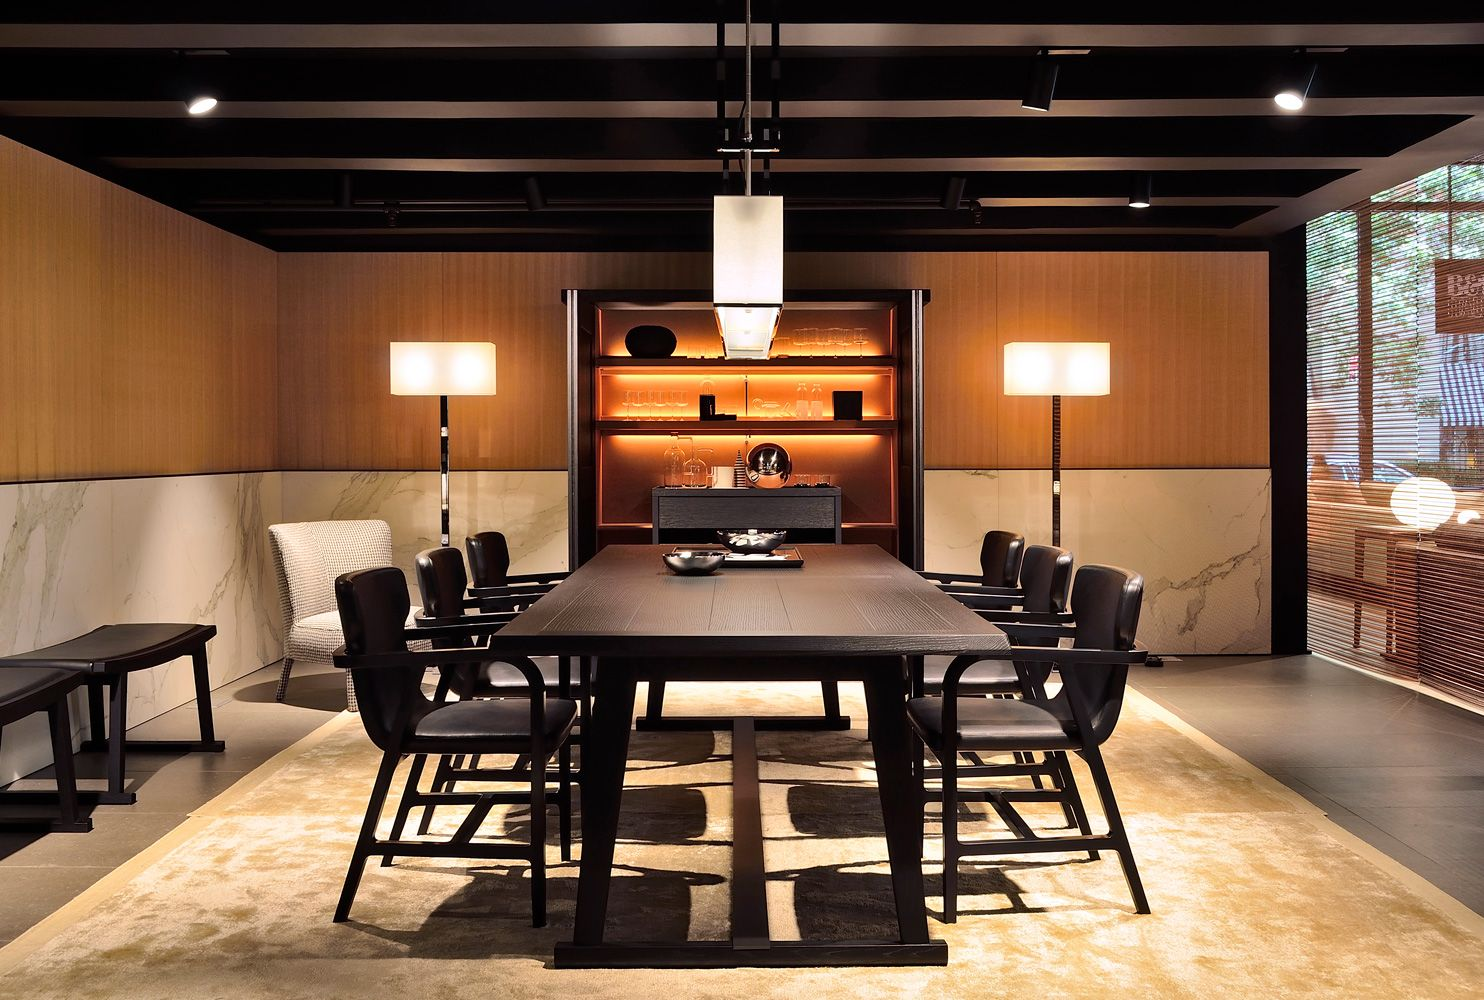 new opening in new york b b italia 03 modern interior rh pinterest com